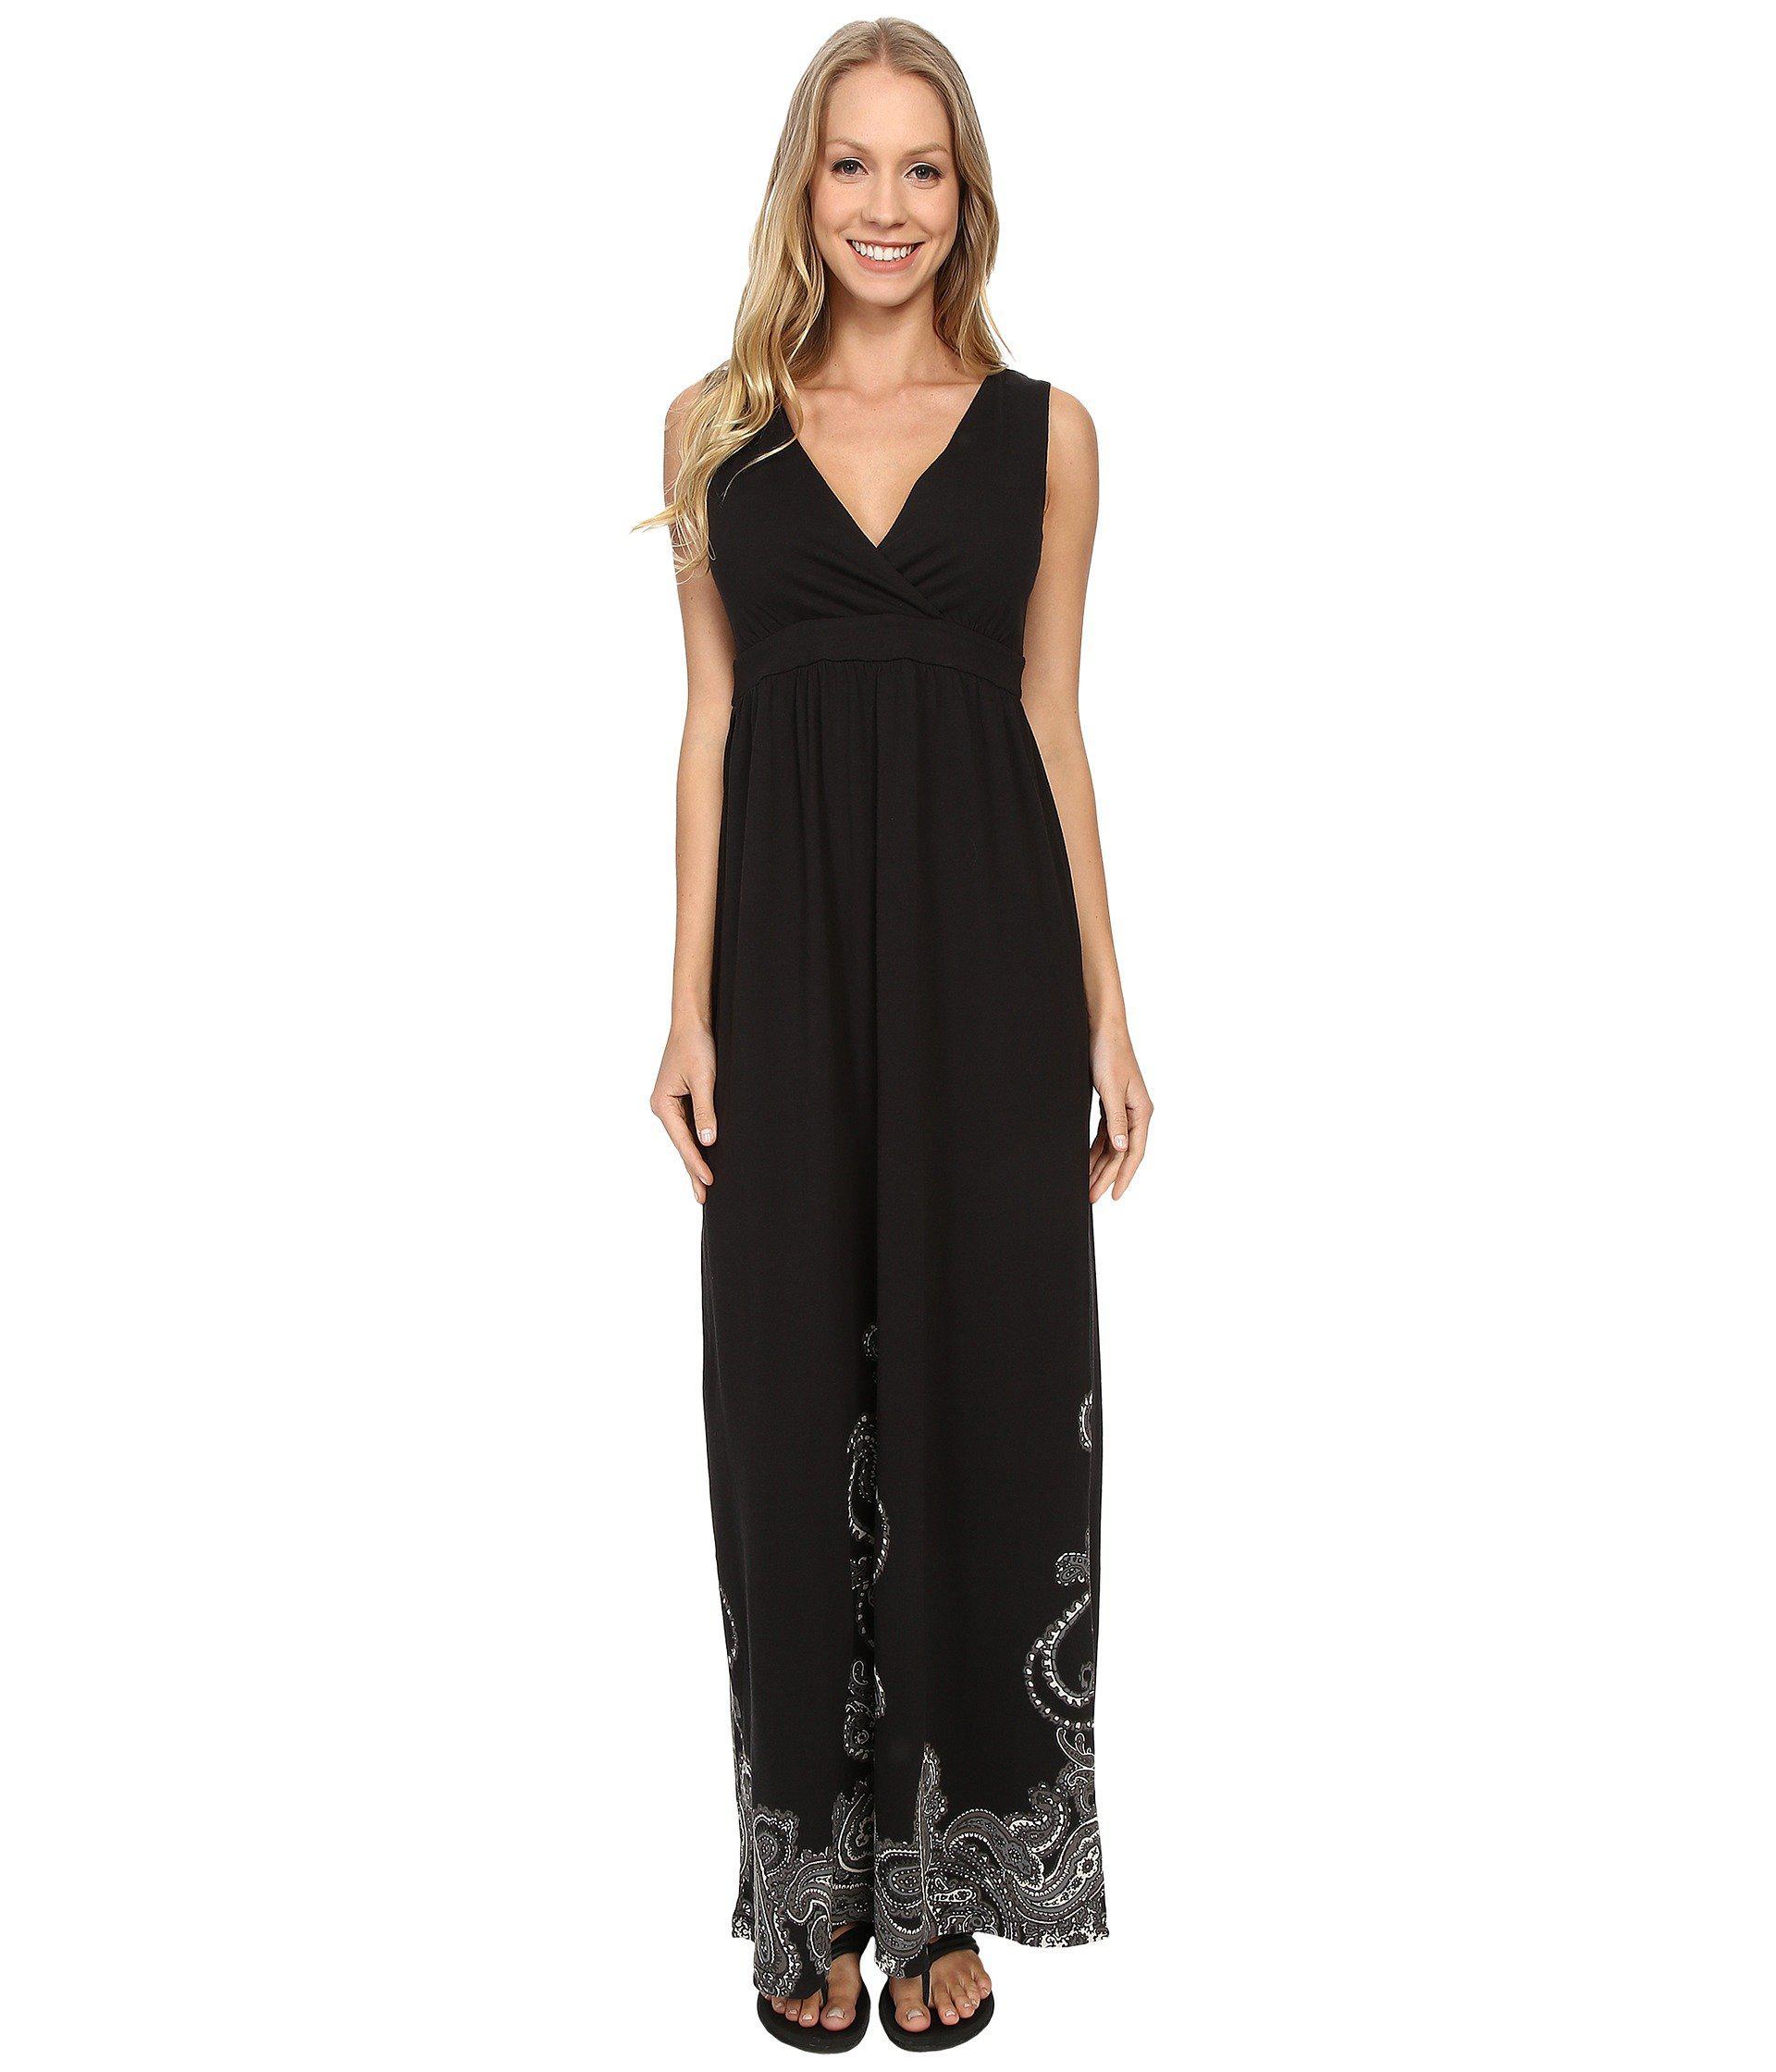 d48b4f92776 Lyst - Aventura Clothing Ashby Maxi Dress in Black